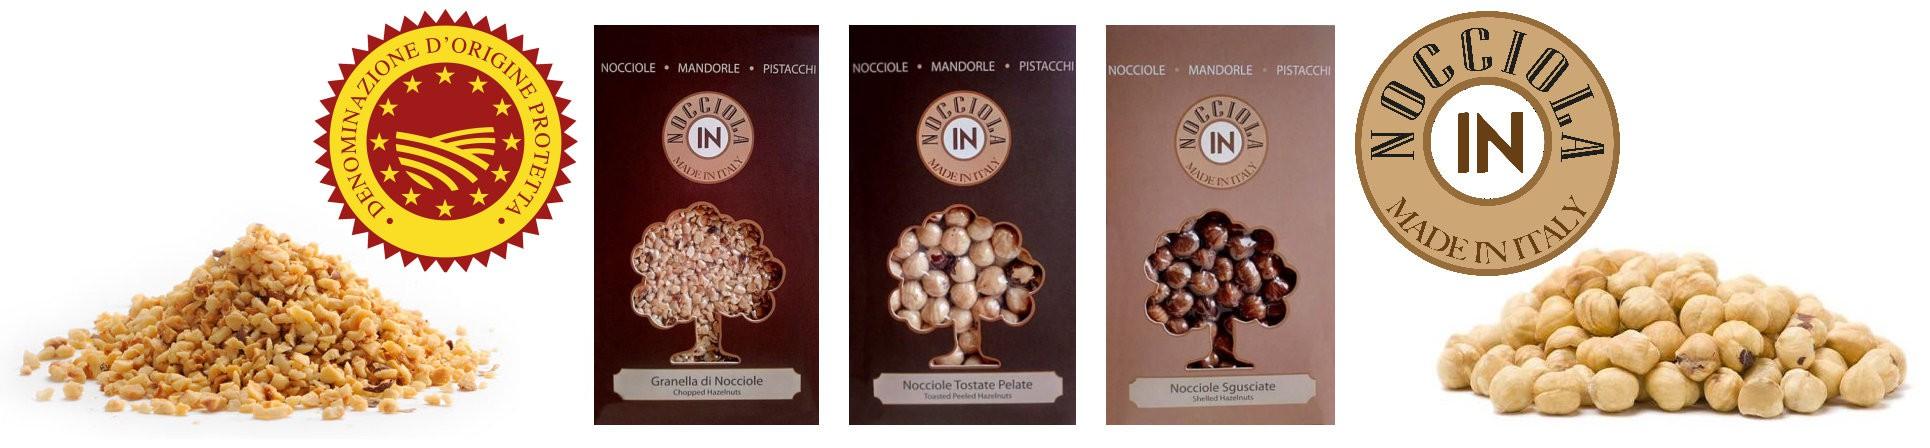 vendita online Nocciole romana acquista online - Nocciola IN